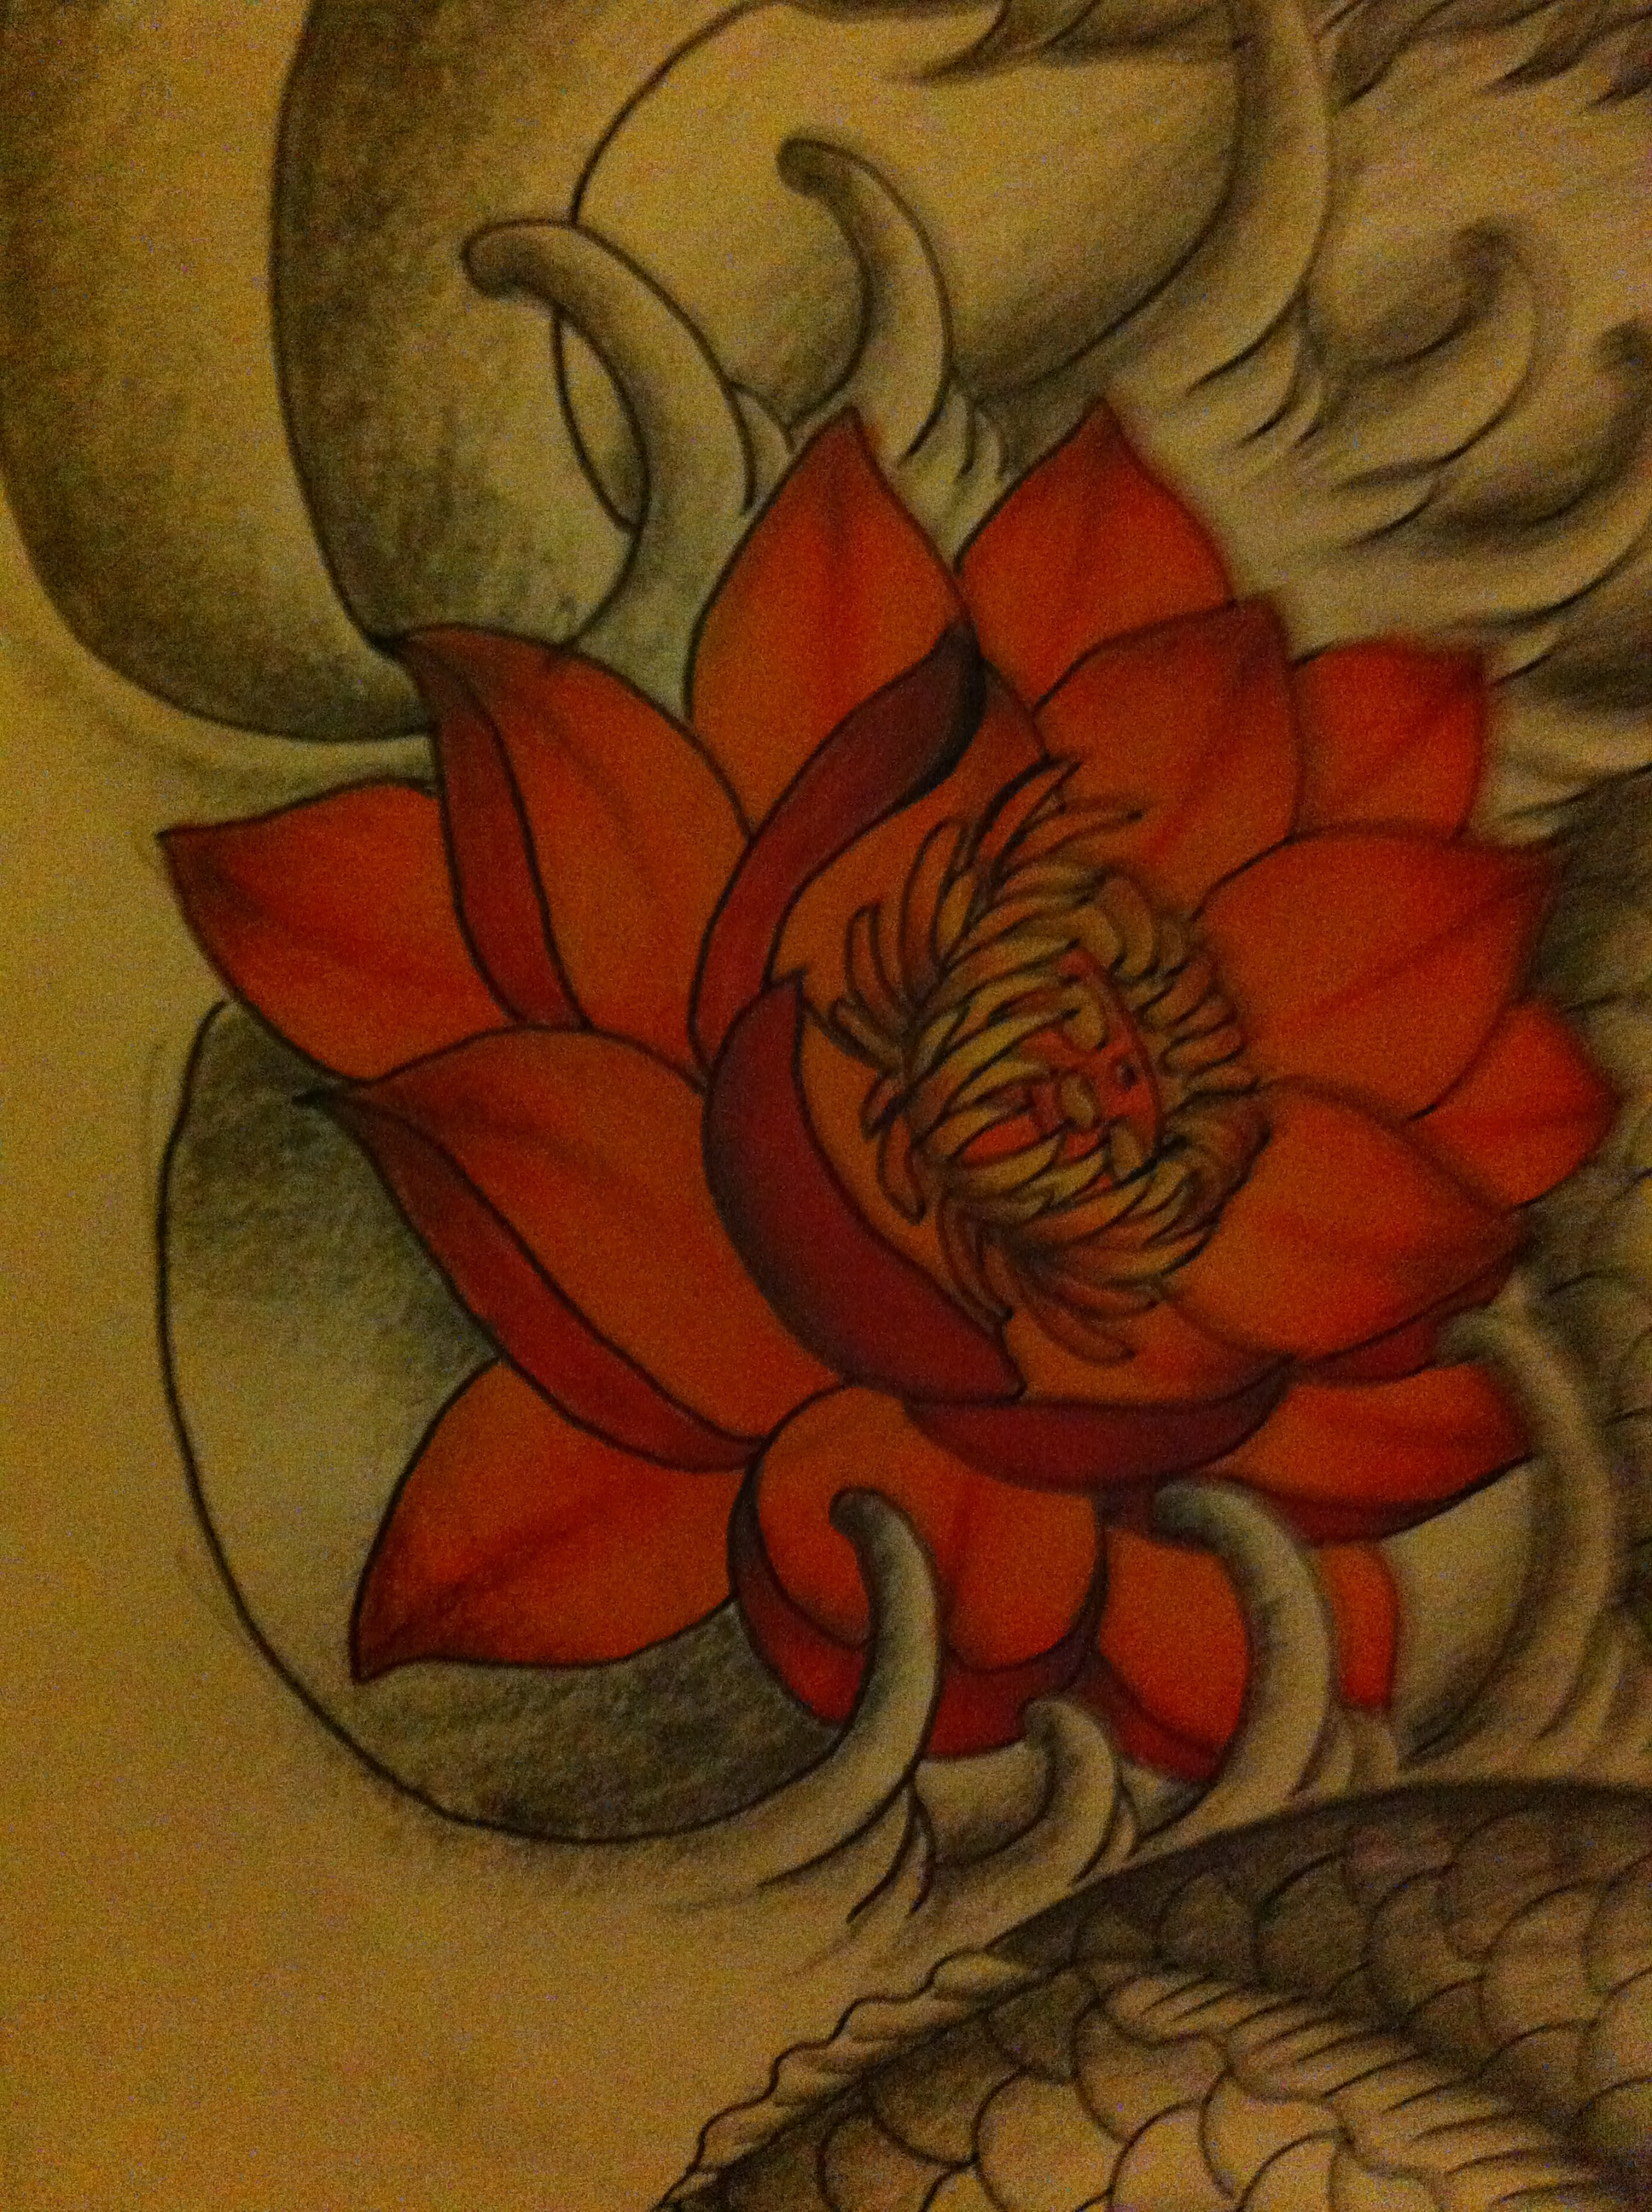 Lotus tattoo design by tattoosuzette on deviantart lotus tattoo design by tattoosuzette lotus tattoo design by tattoosuzette izmirmasajfo